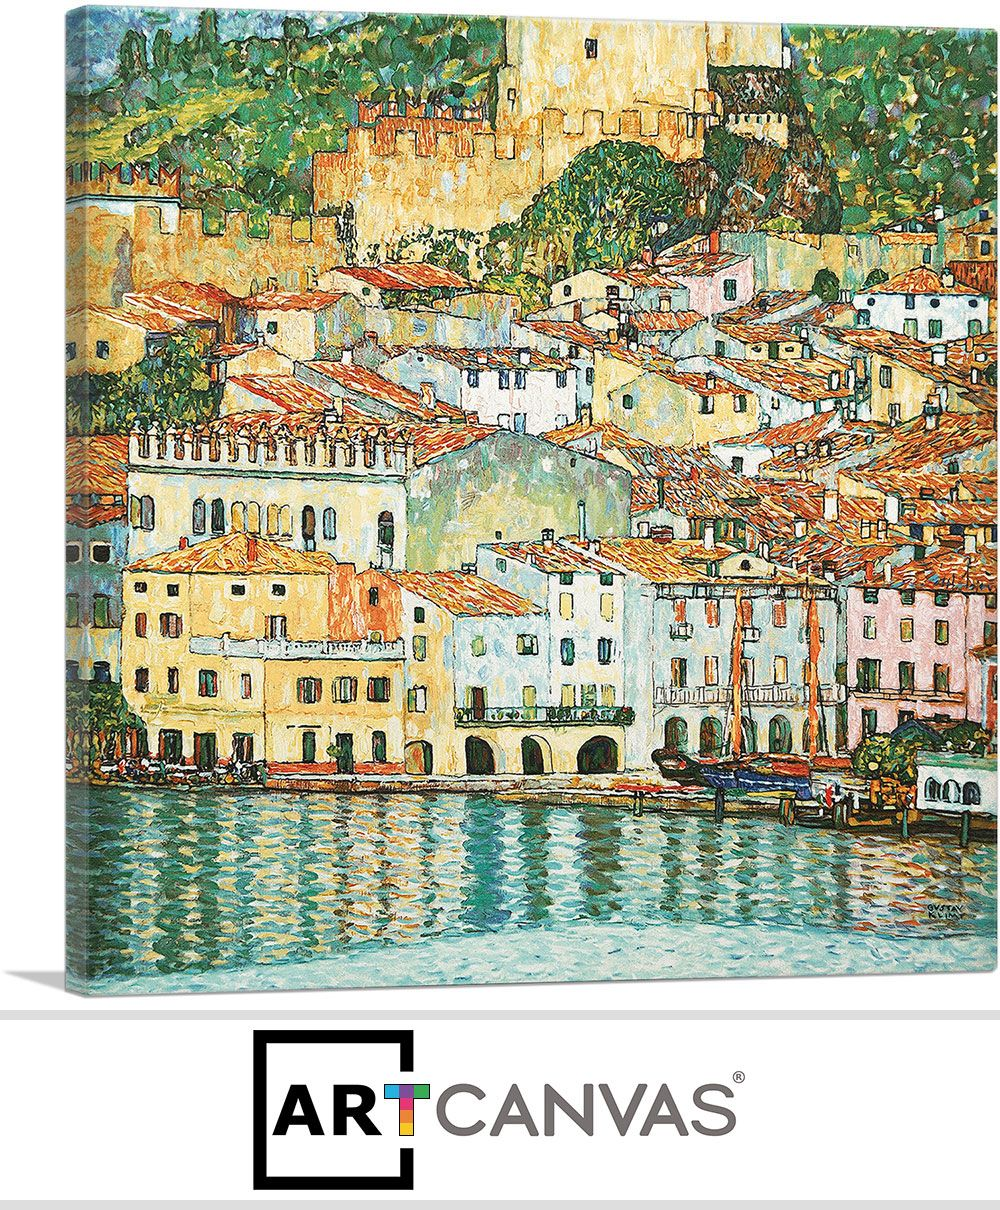 ARTCANVAS Malcesine Lake Garda 1913 Canvas Art Print by Gustav Klimt